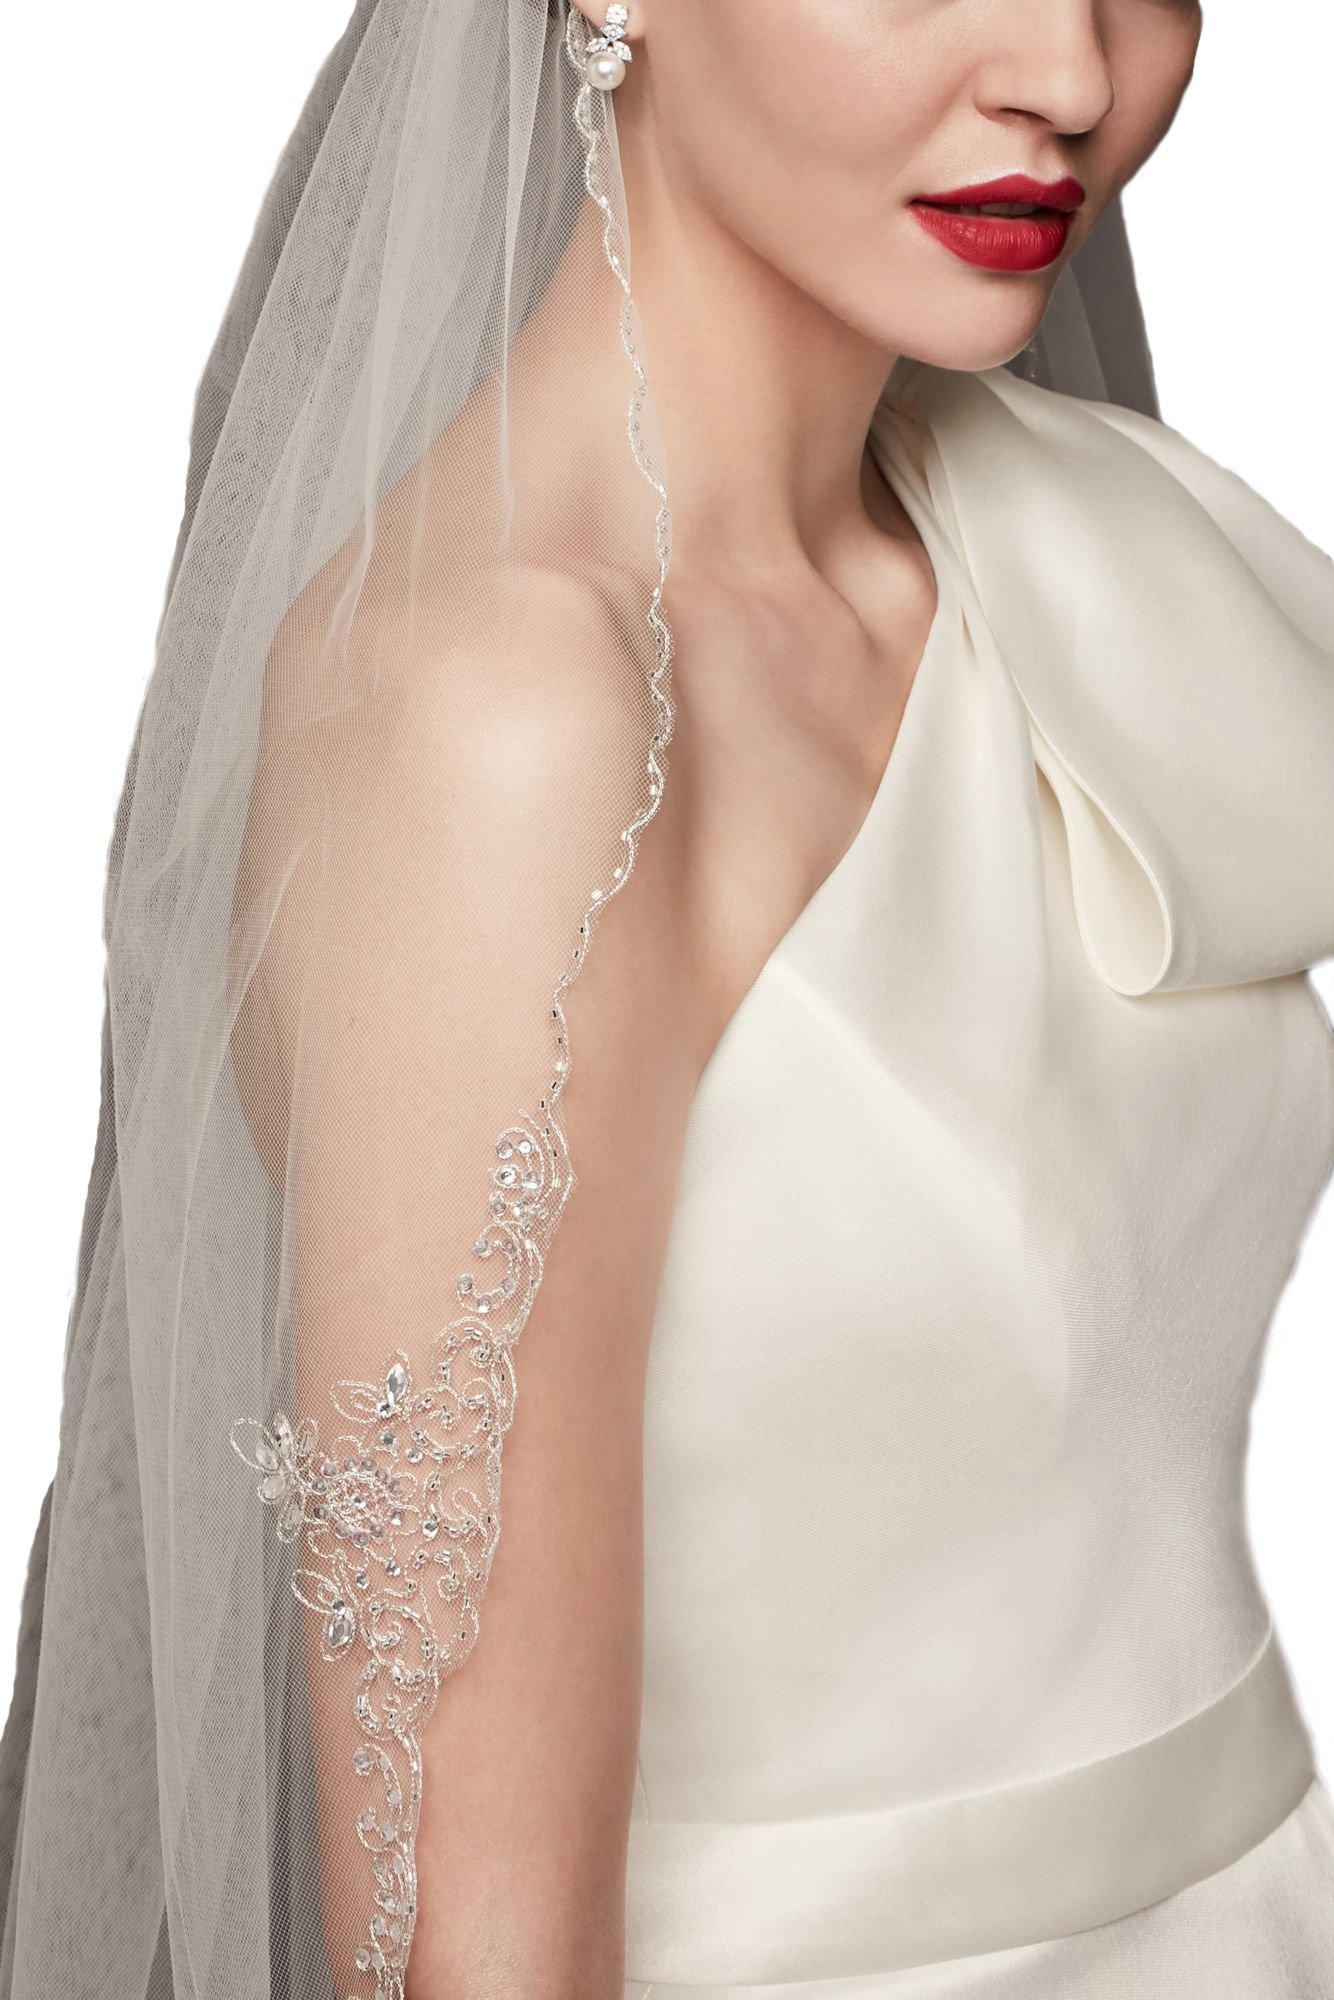 Passat Ivory 1T Ballet/Tea Metallic Embroidered Crest bridal veil rhinestones DB121